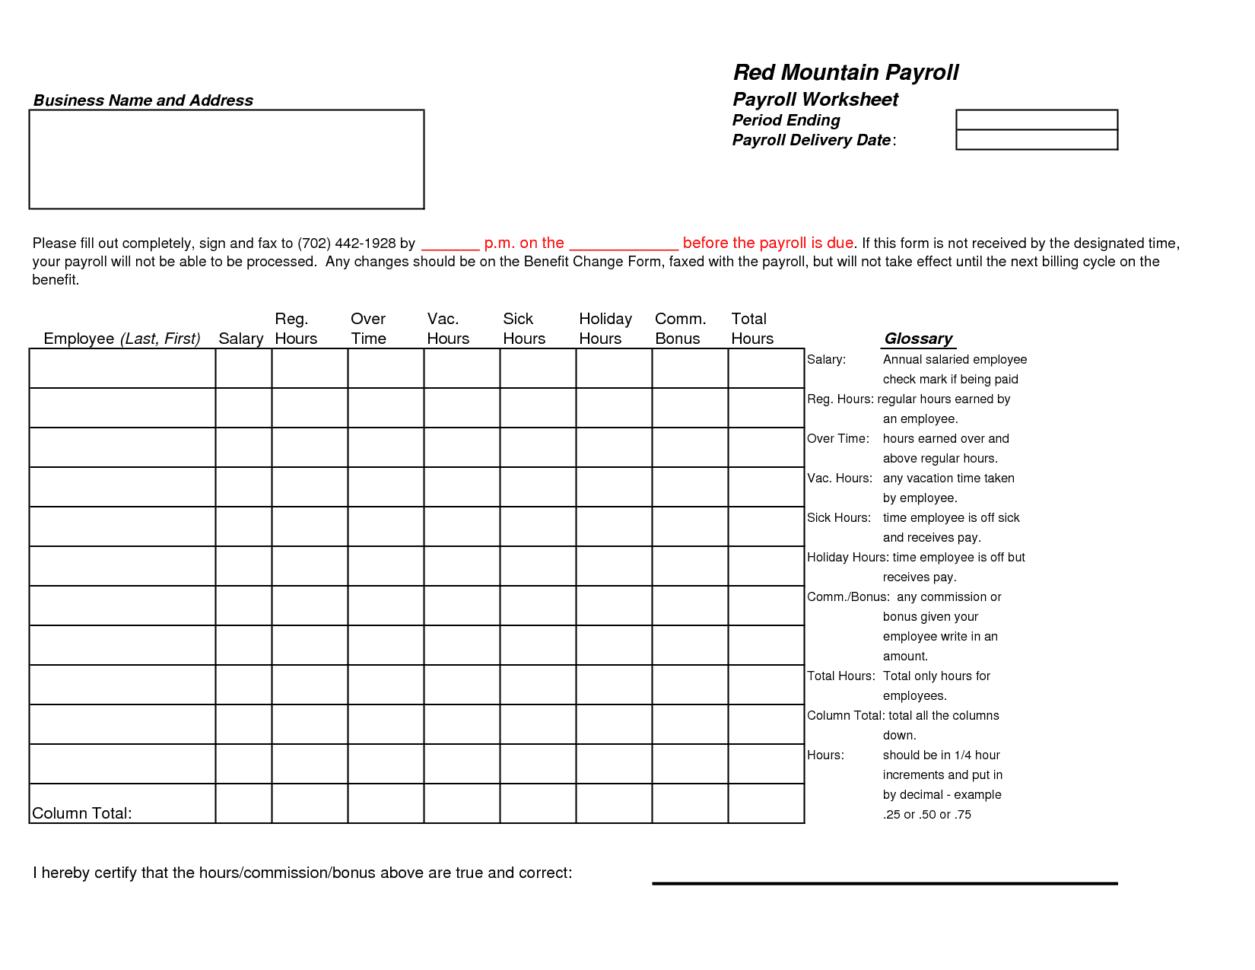 payroll spreadsheet template payroll spreadsheet spreadsheet templates for busines excel payroll. Black Bedroom Furniture Sets. Home Design Ideas